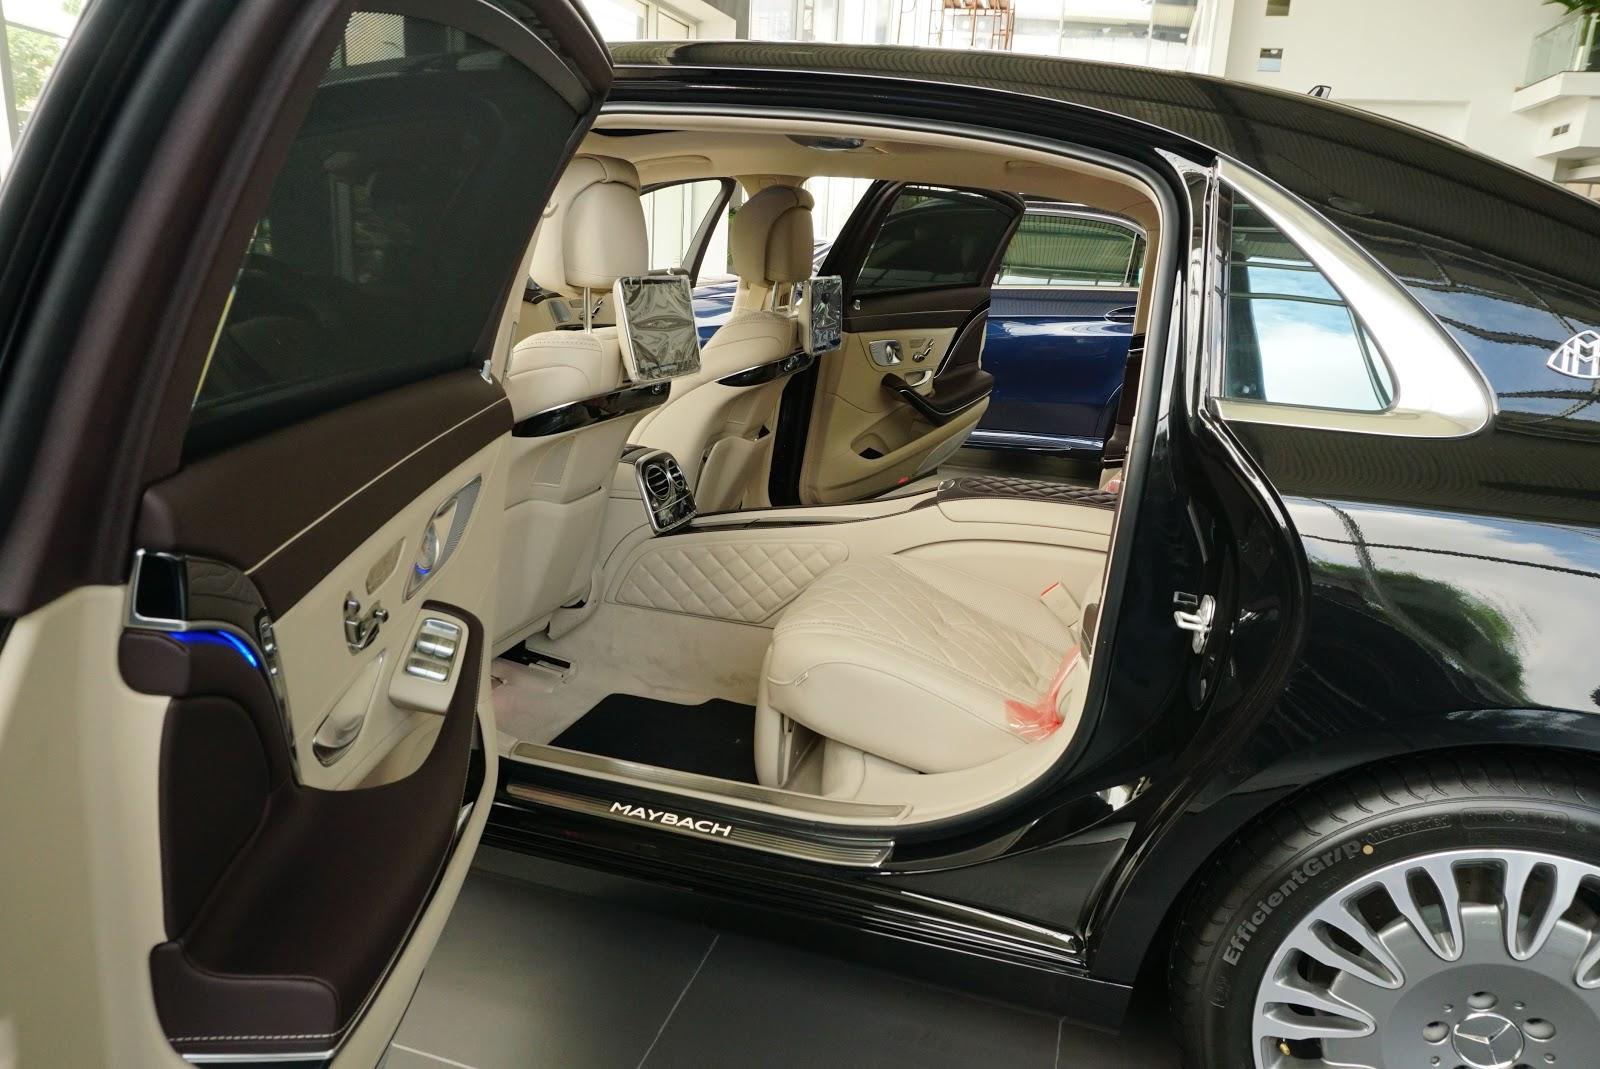 Ngoại Thất Xe Mercedes Benz S600 MAYBACH Màu Đen a09